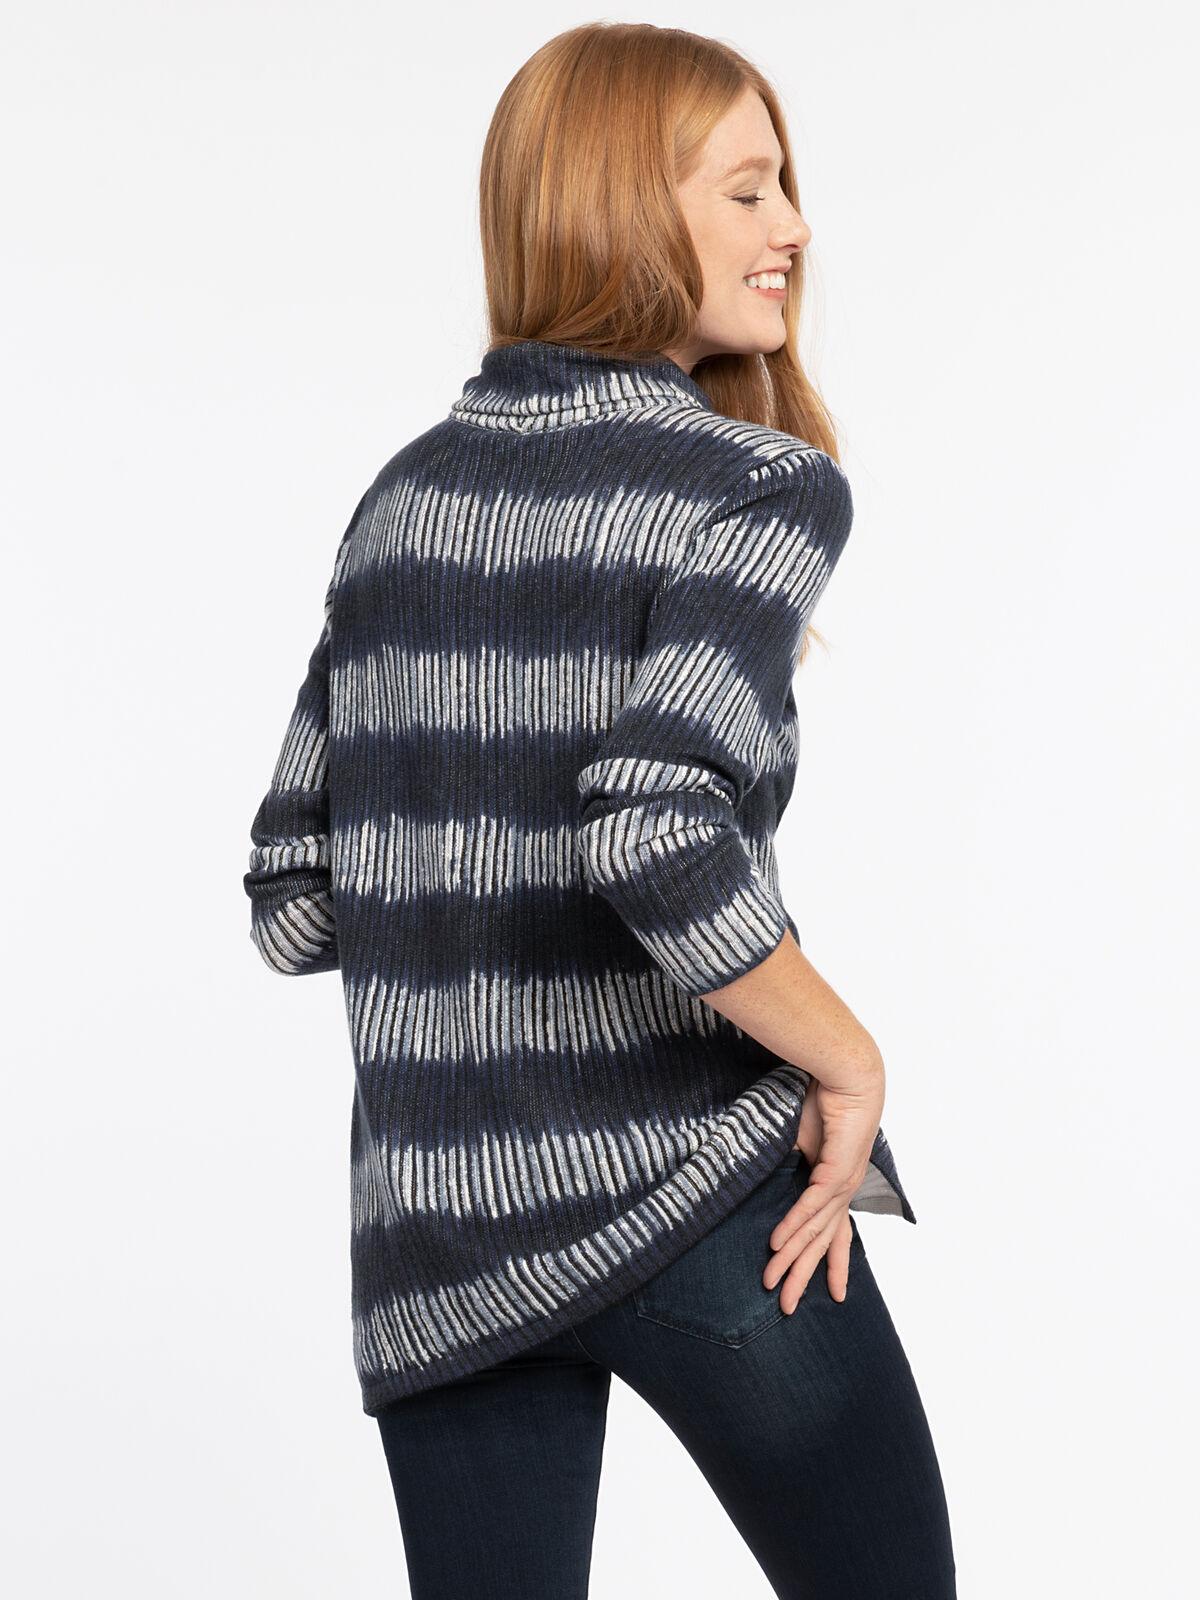 Traverse Sweater